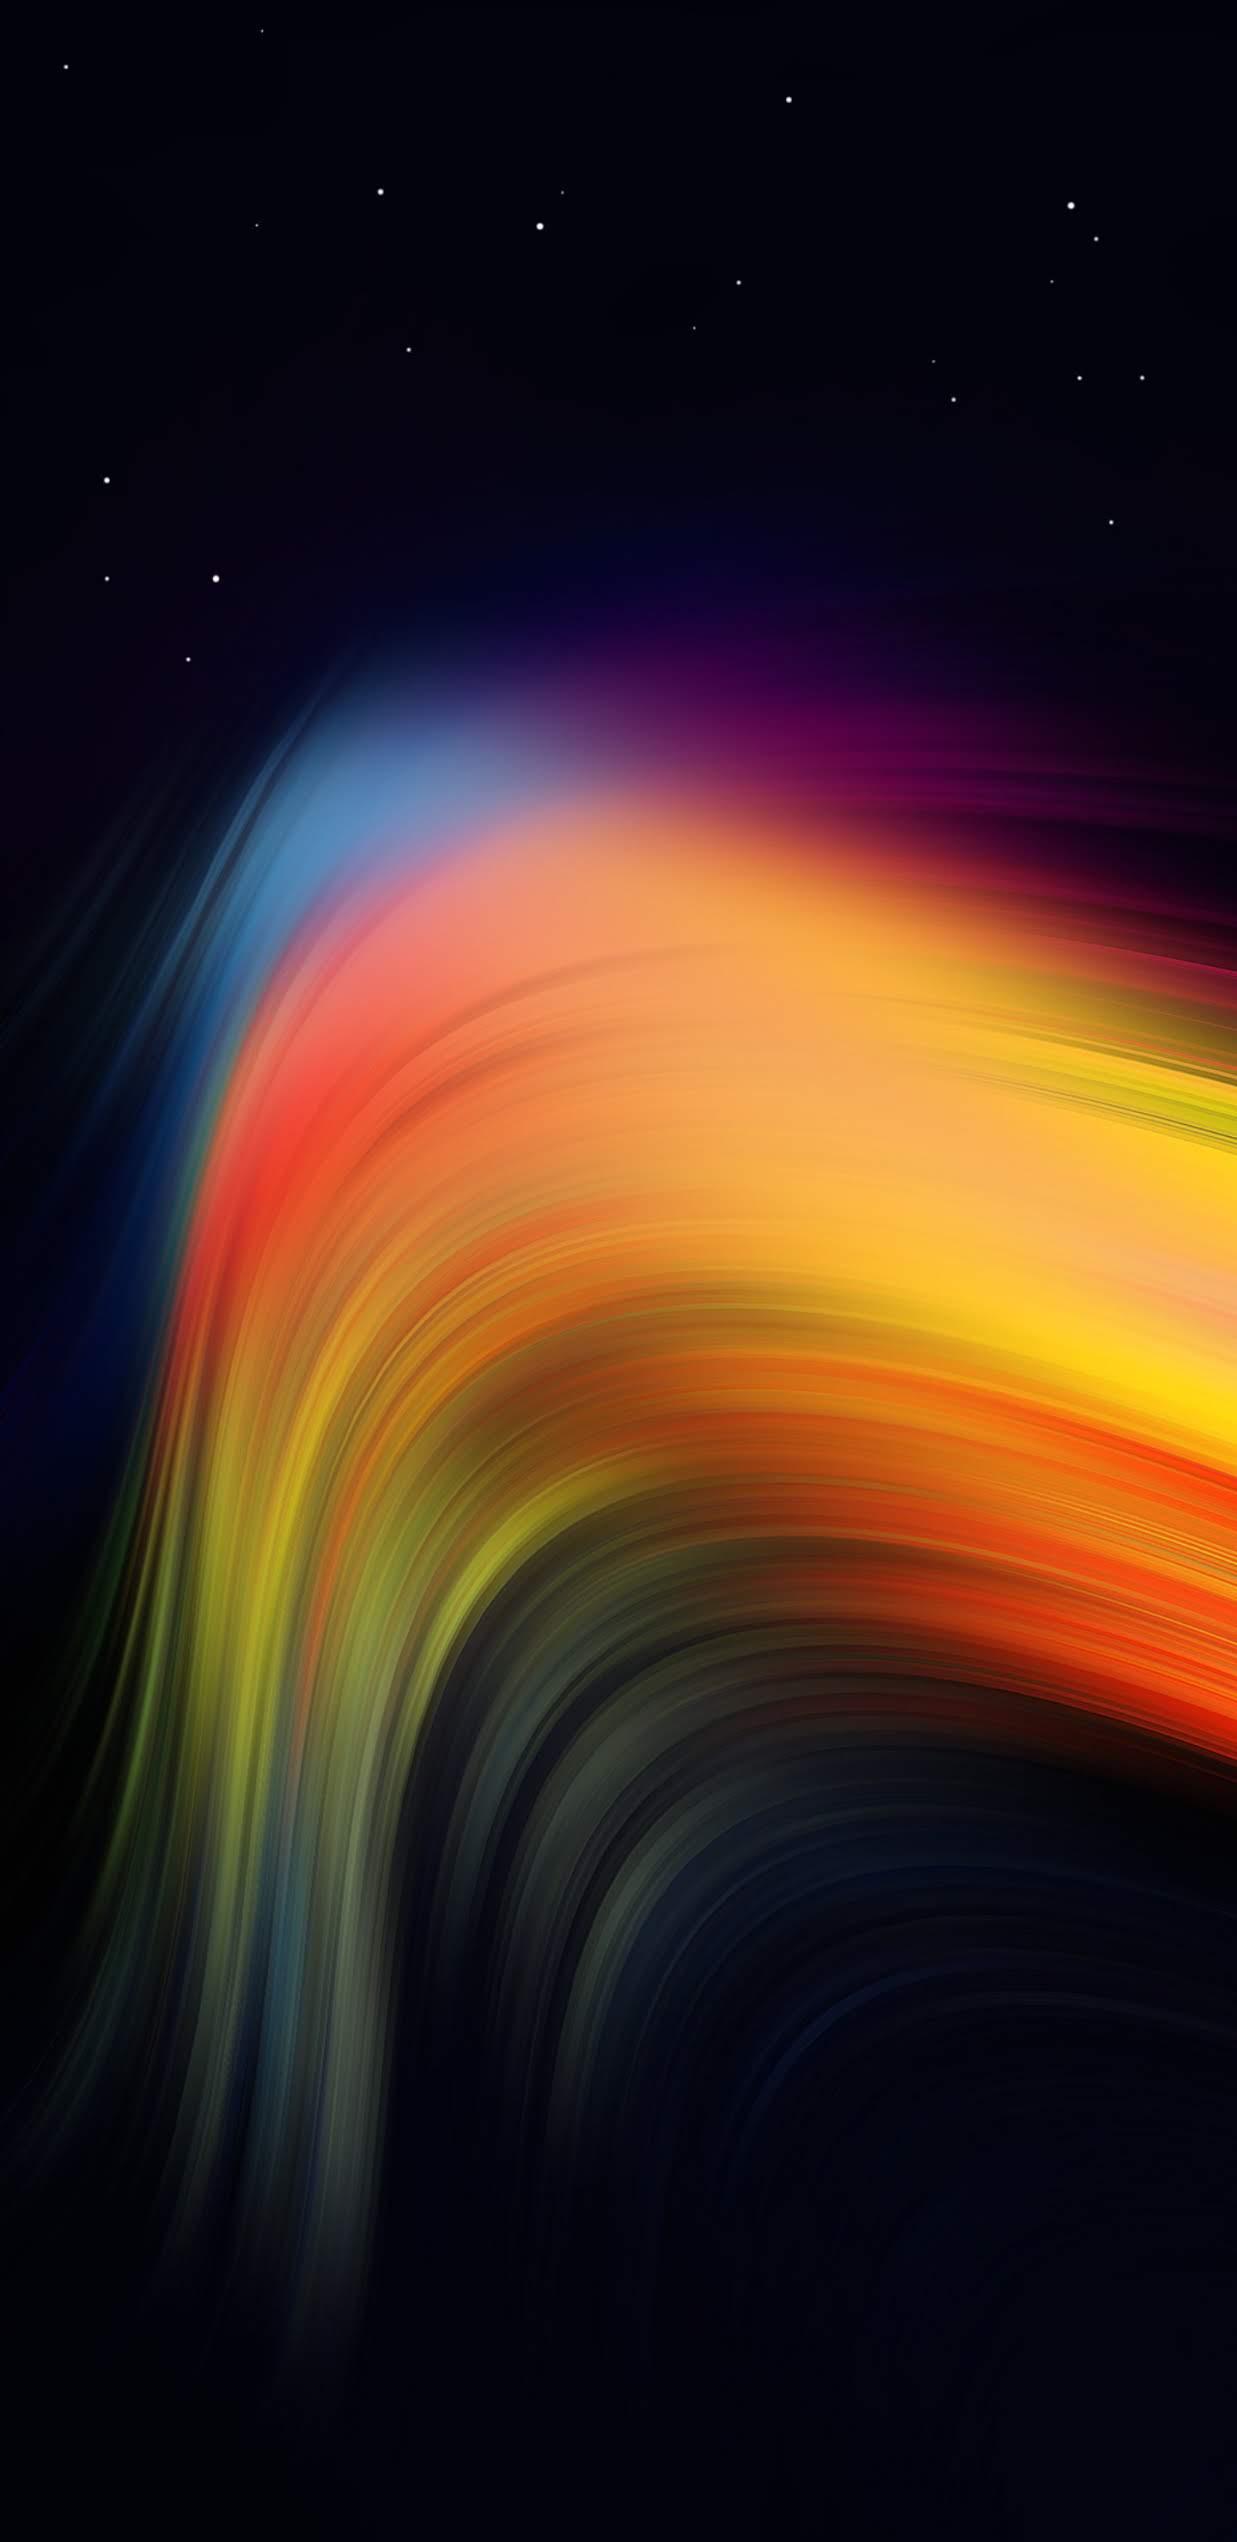 Samsung Infinity Wallpaper Hd ✓ The Best HD Wallpaper